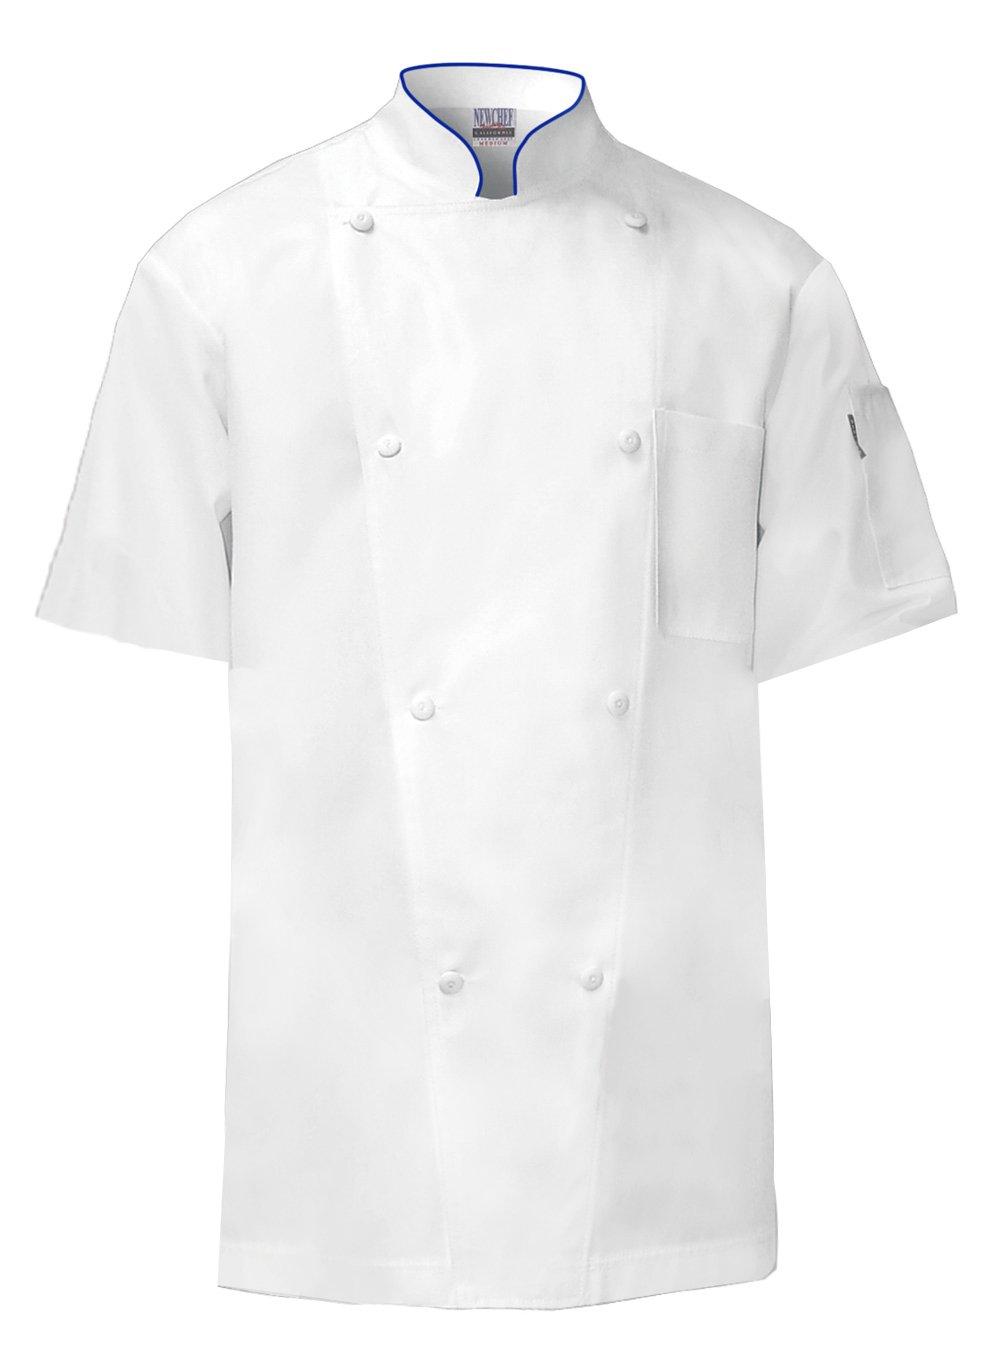 Newchef Fashion White Regent Short Sleeves Chef Coat with Royal Blue Trim 3XL White